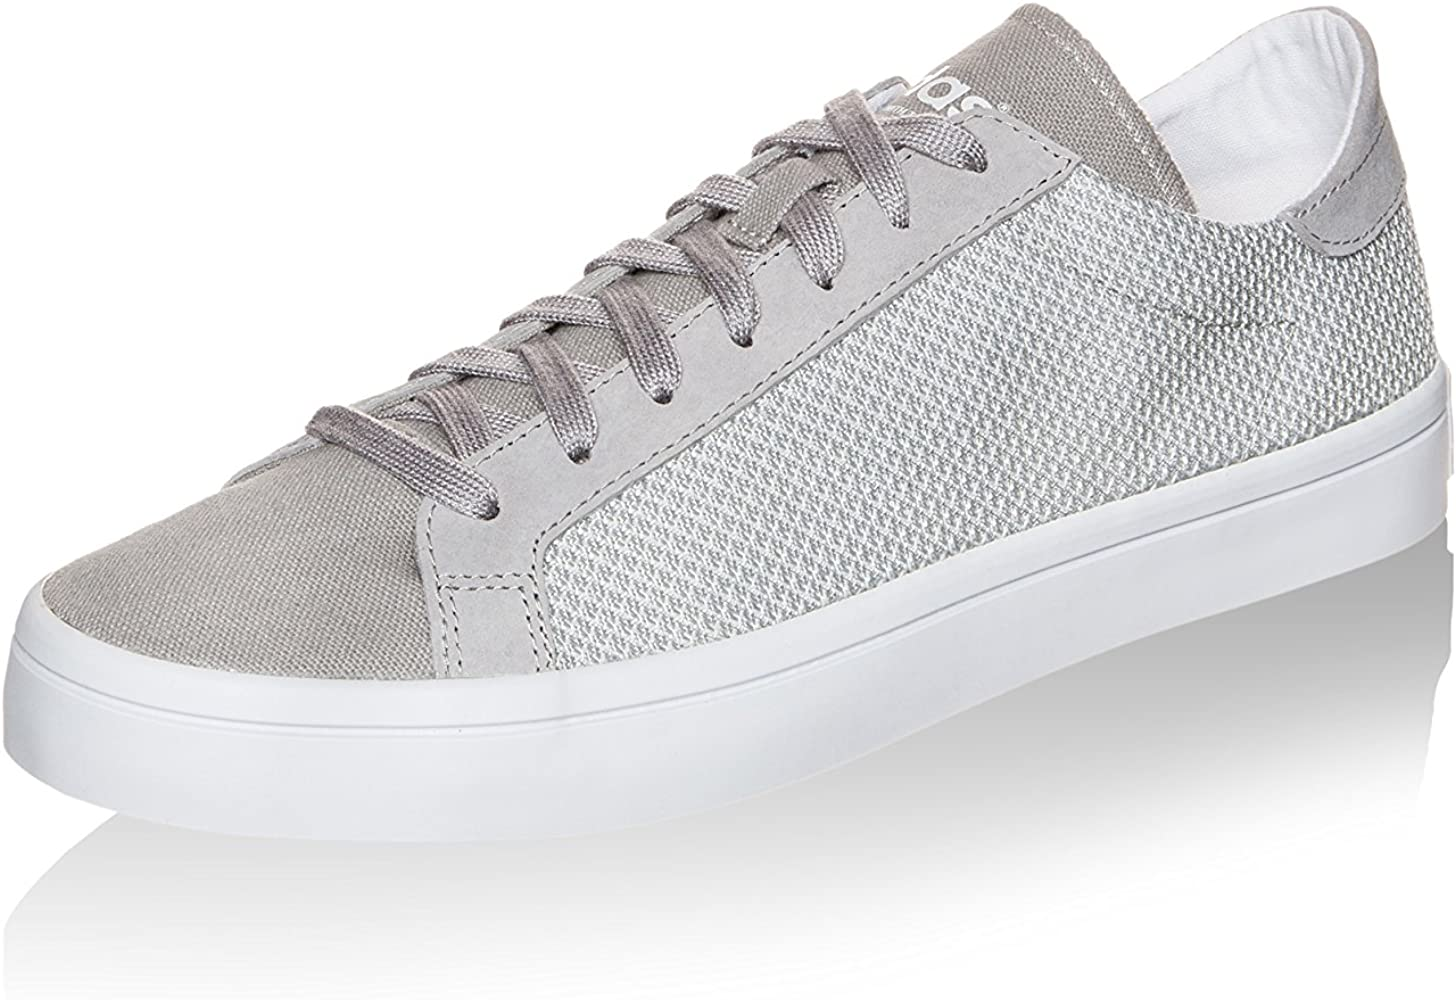 Los Angeles 27d93 63ab8 adidas Court Vantage chaussures 3,5 mgsogr/ftwr white ...